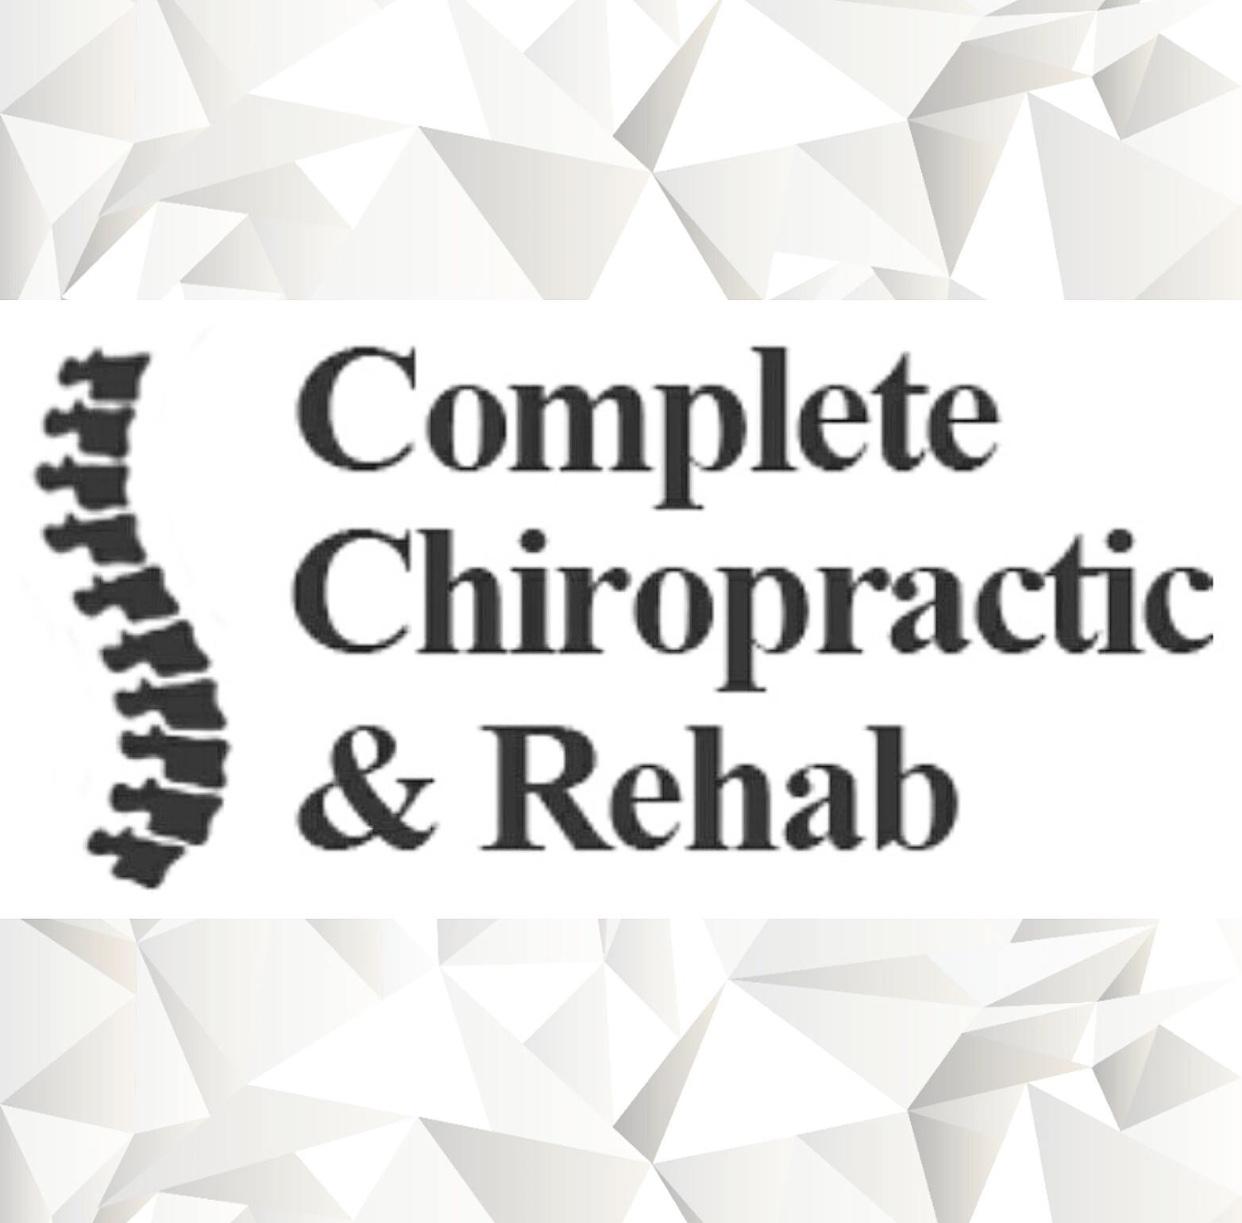 Sponsor Complete Chiropractic & Rehab